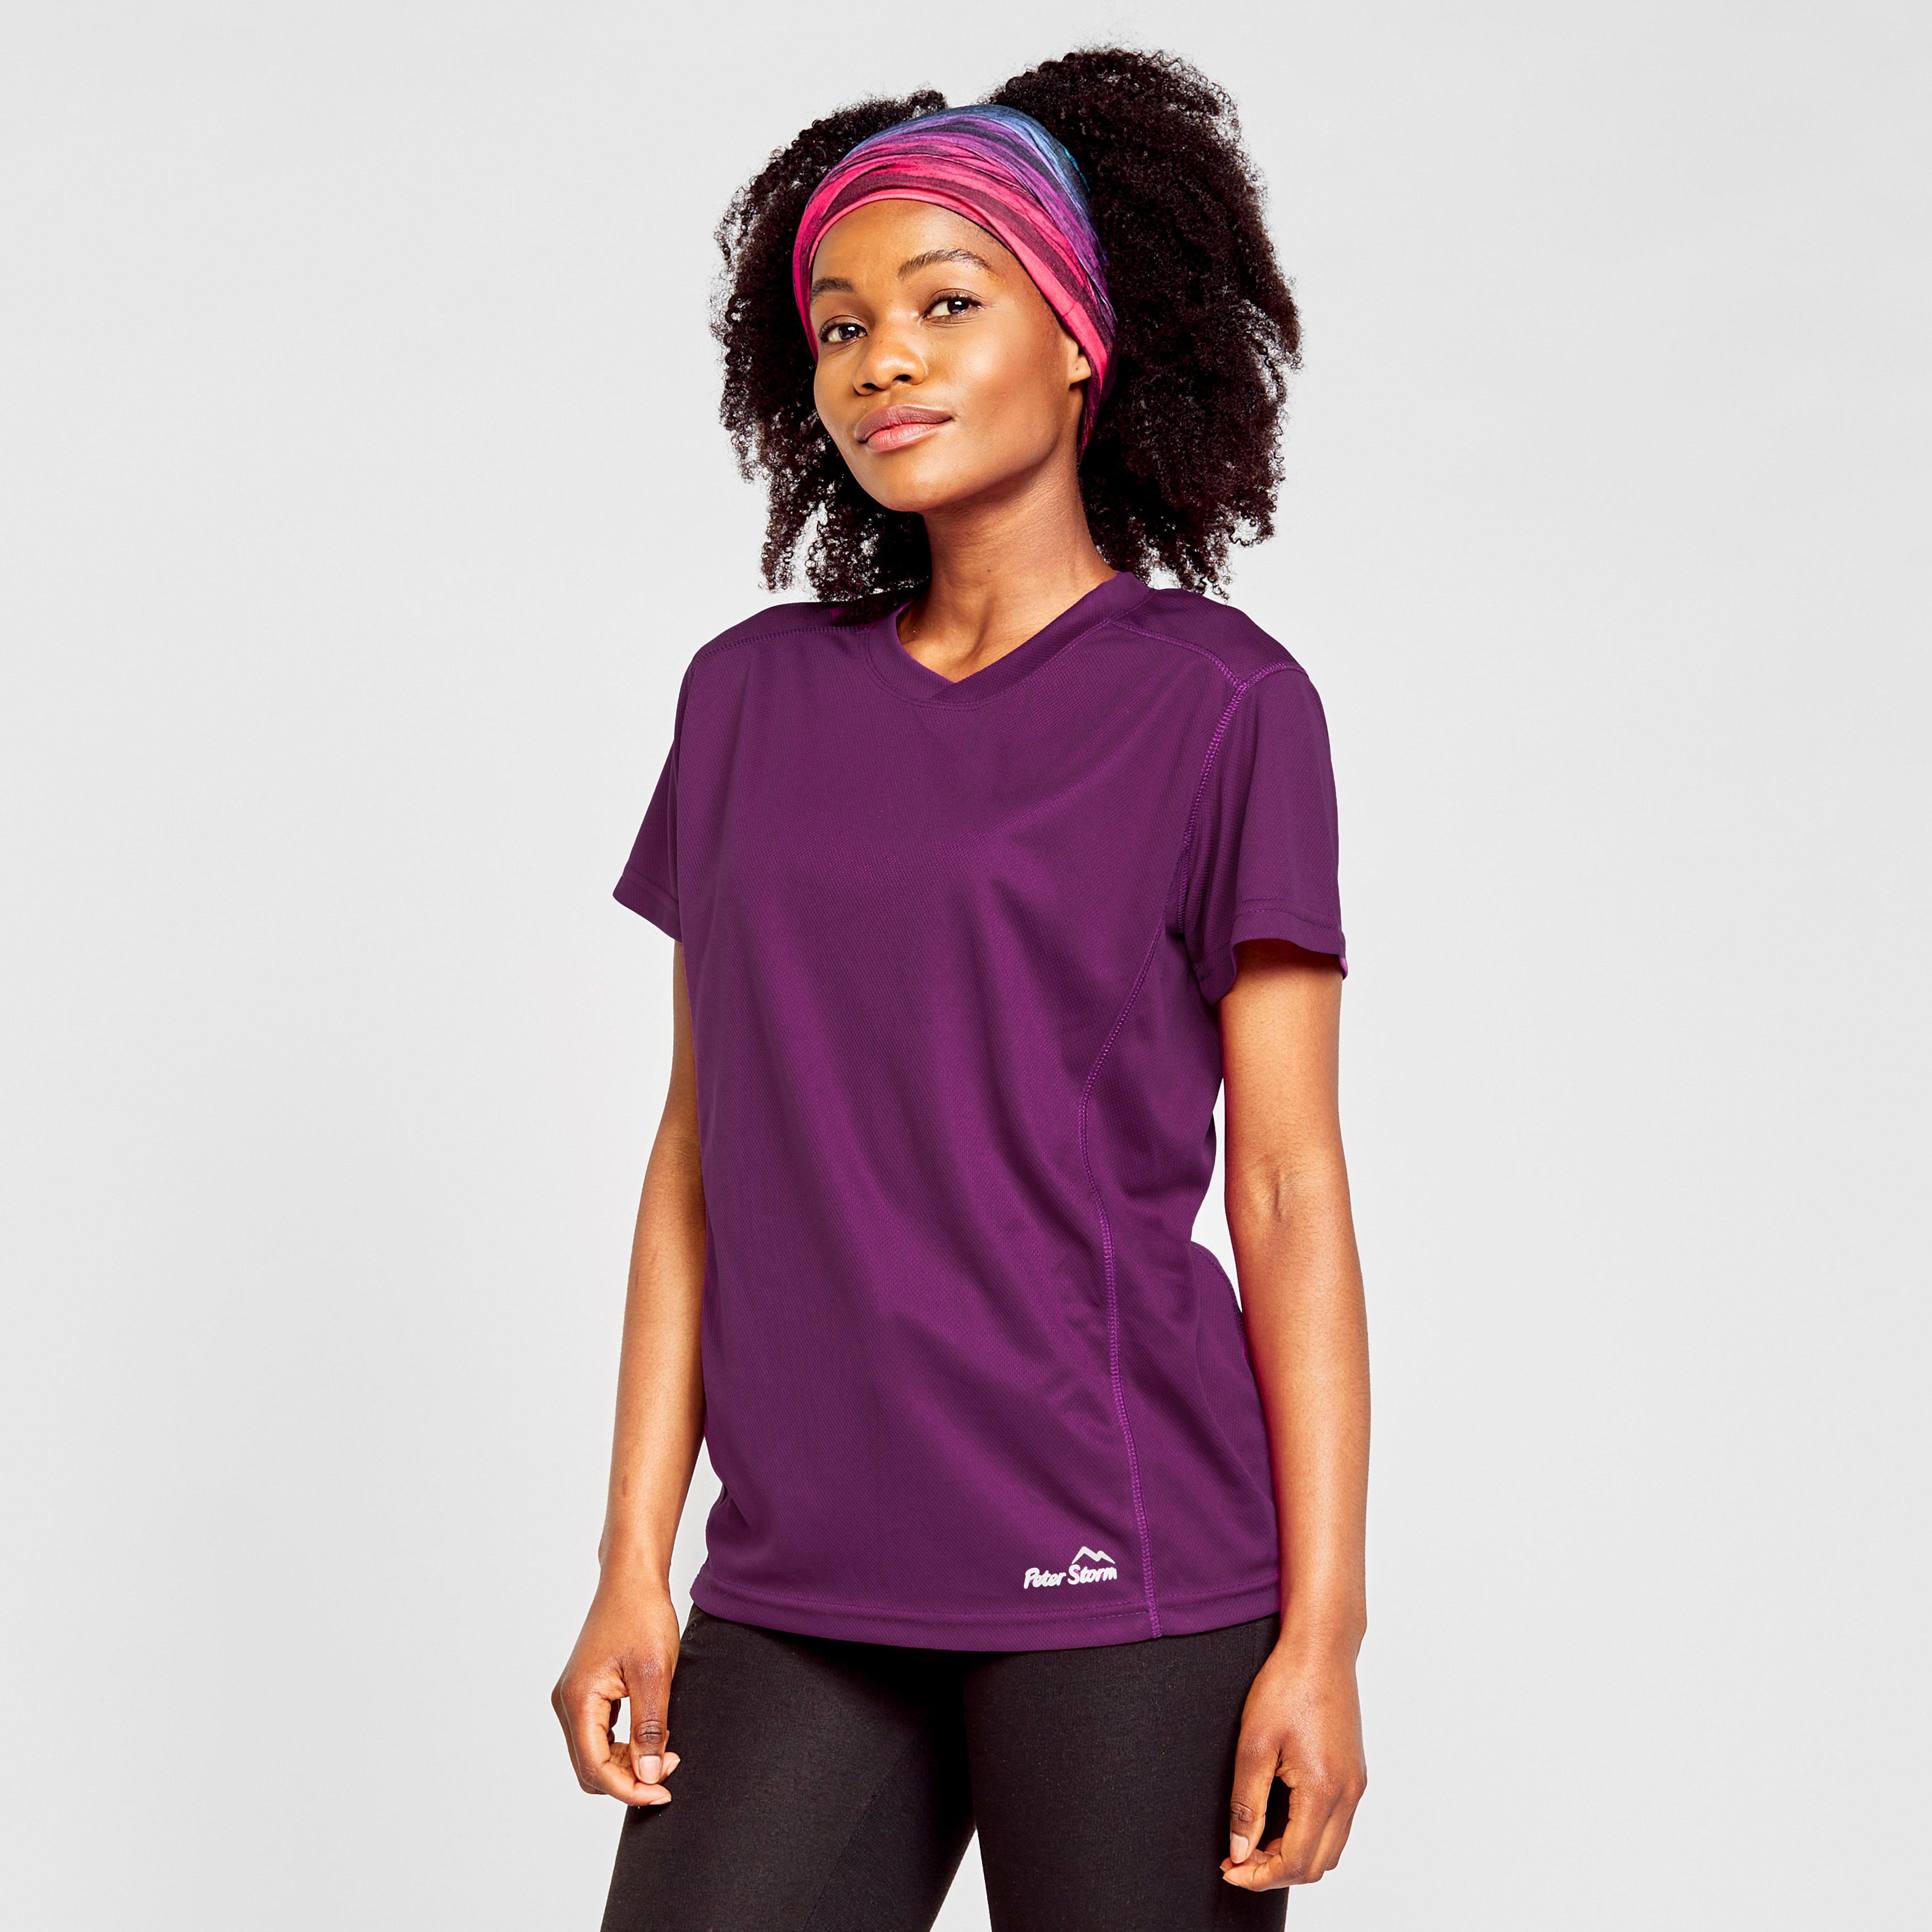 Image of Peter Storm Women's Short Sleeve Tech Tee - Purple/Pur, Purple/PUR